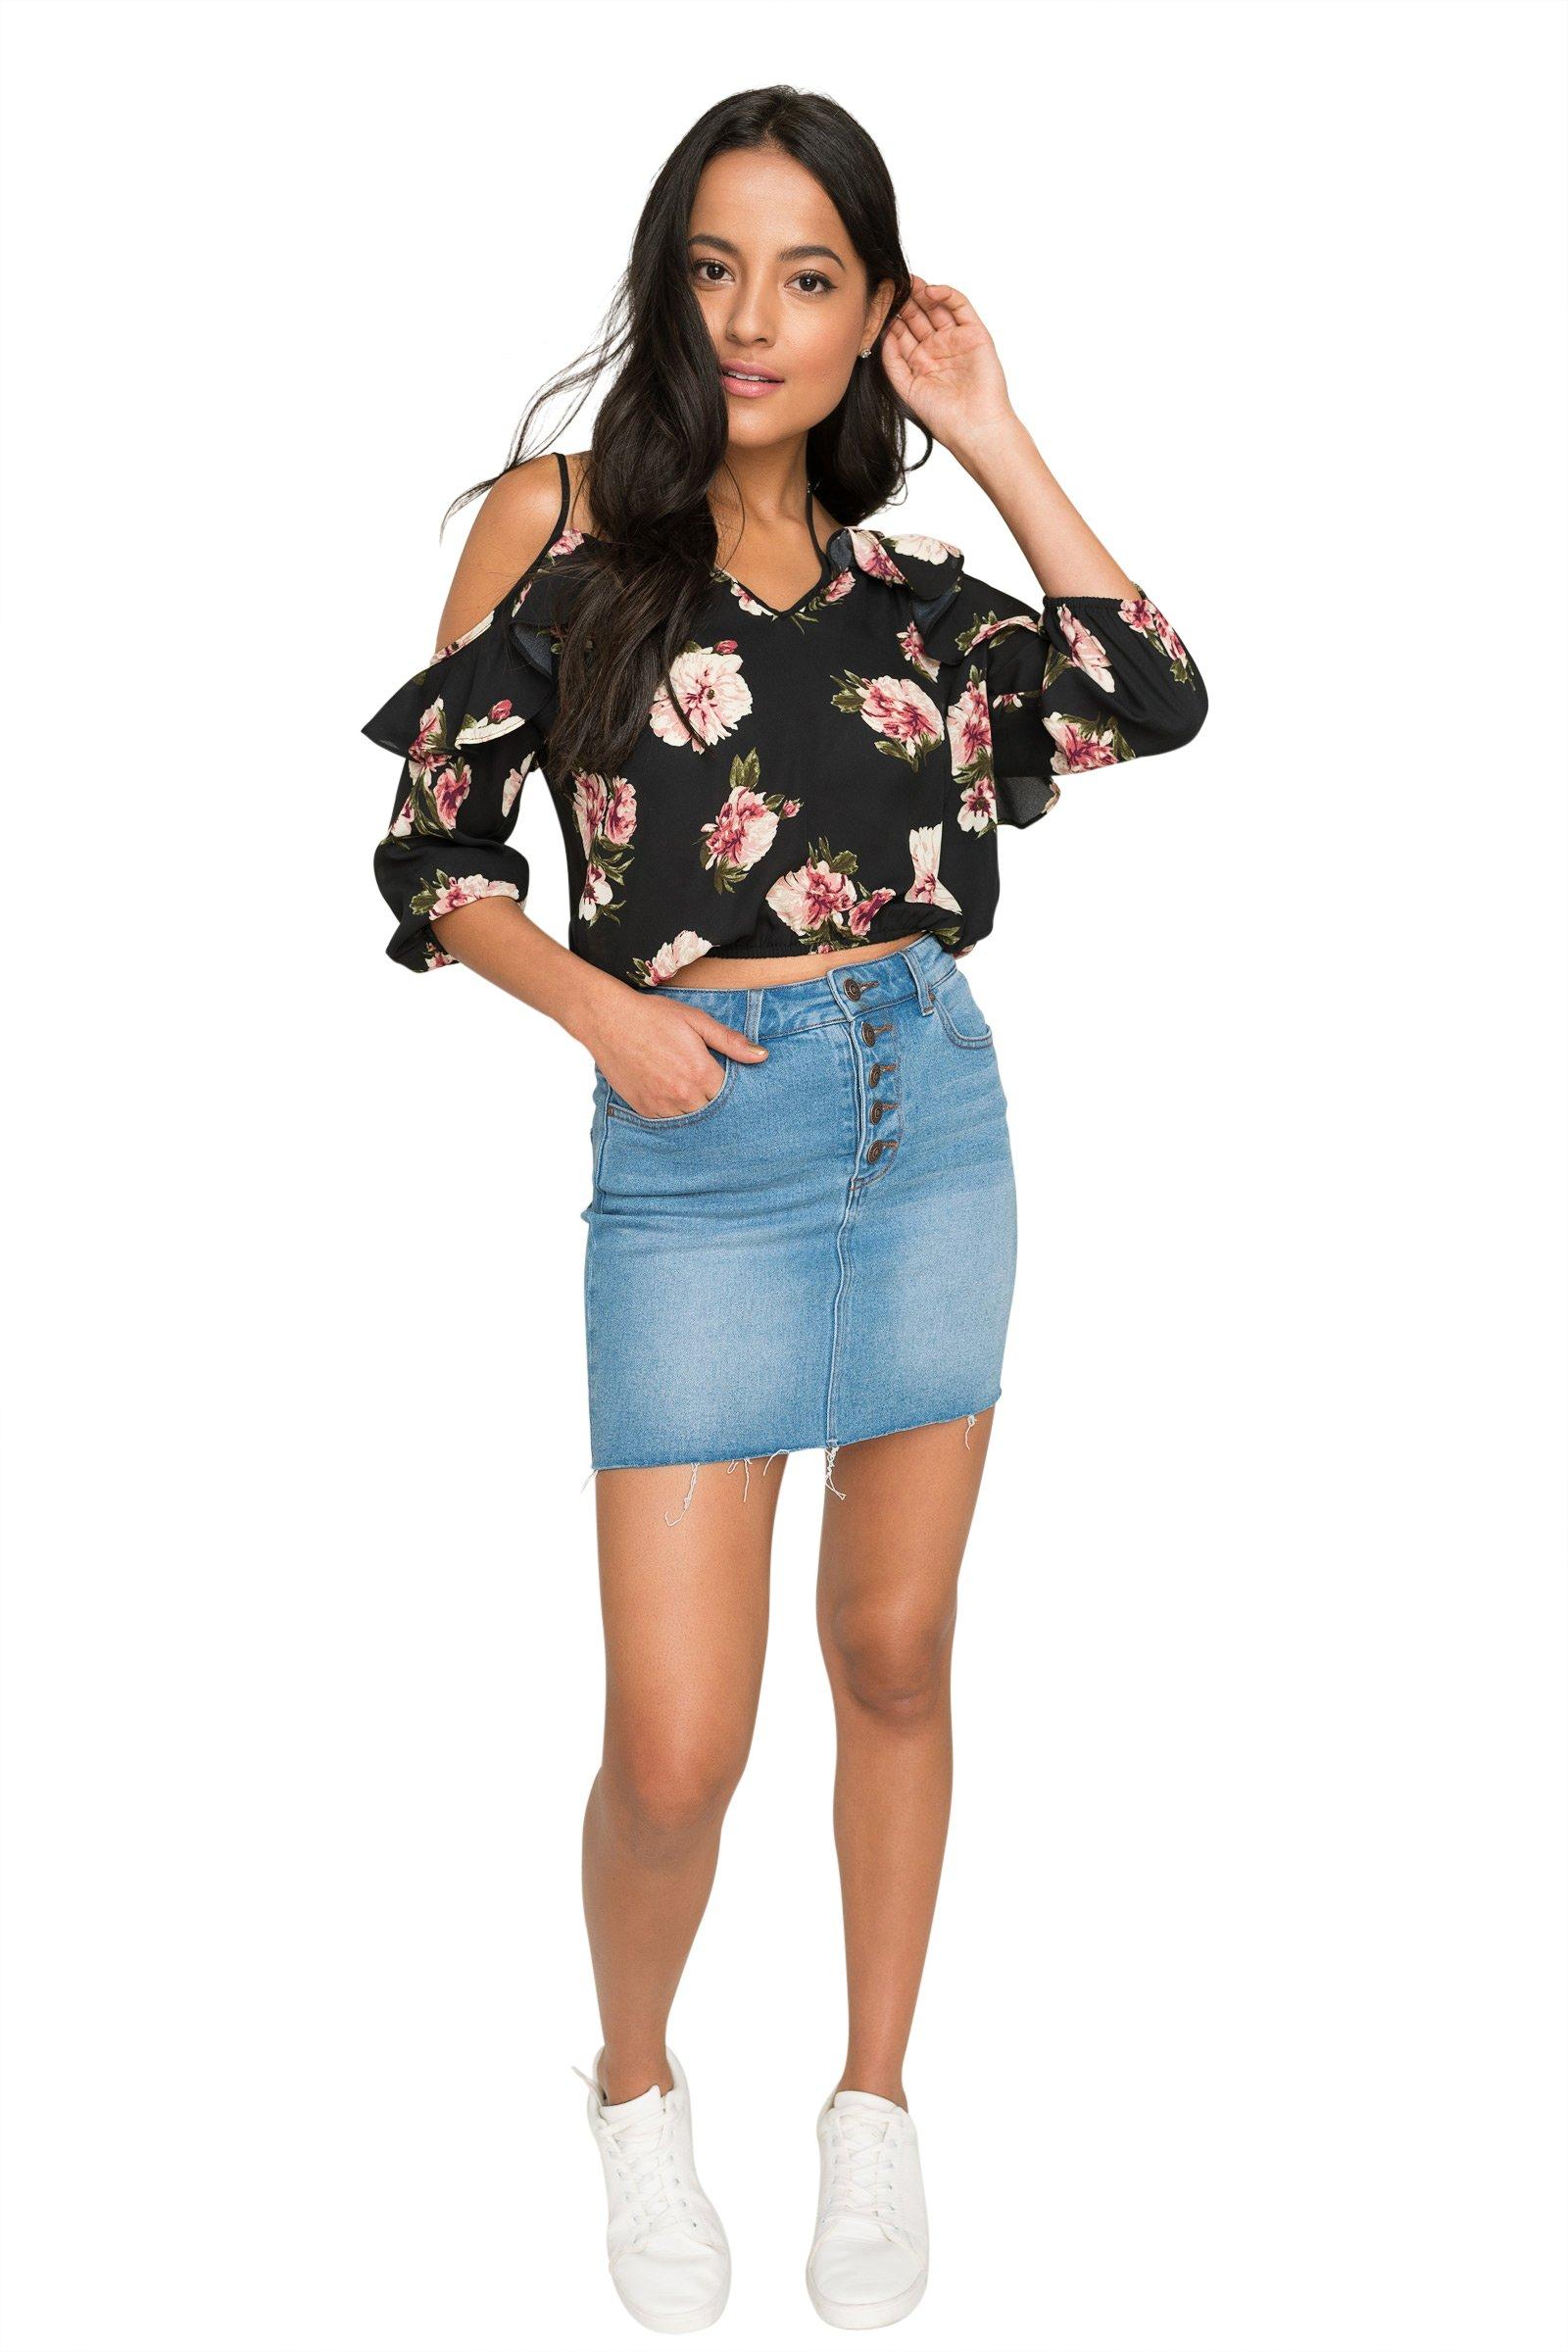 b086850889c453 Ardene - Women s - Shirts   Blouses - Cold Shoulder Crop Top Small  -(8A-AP01323)